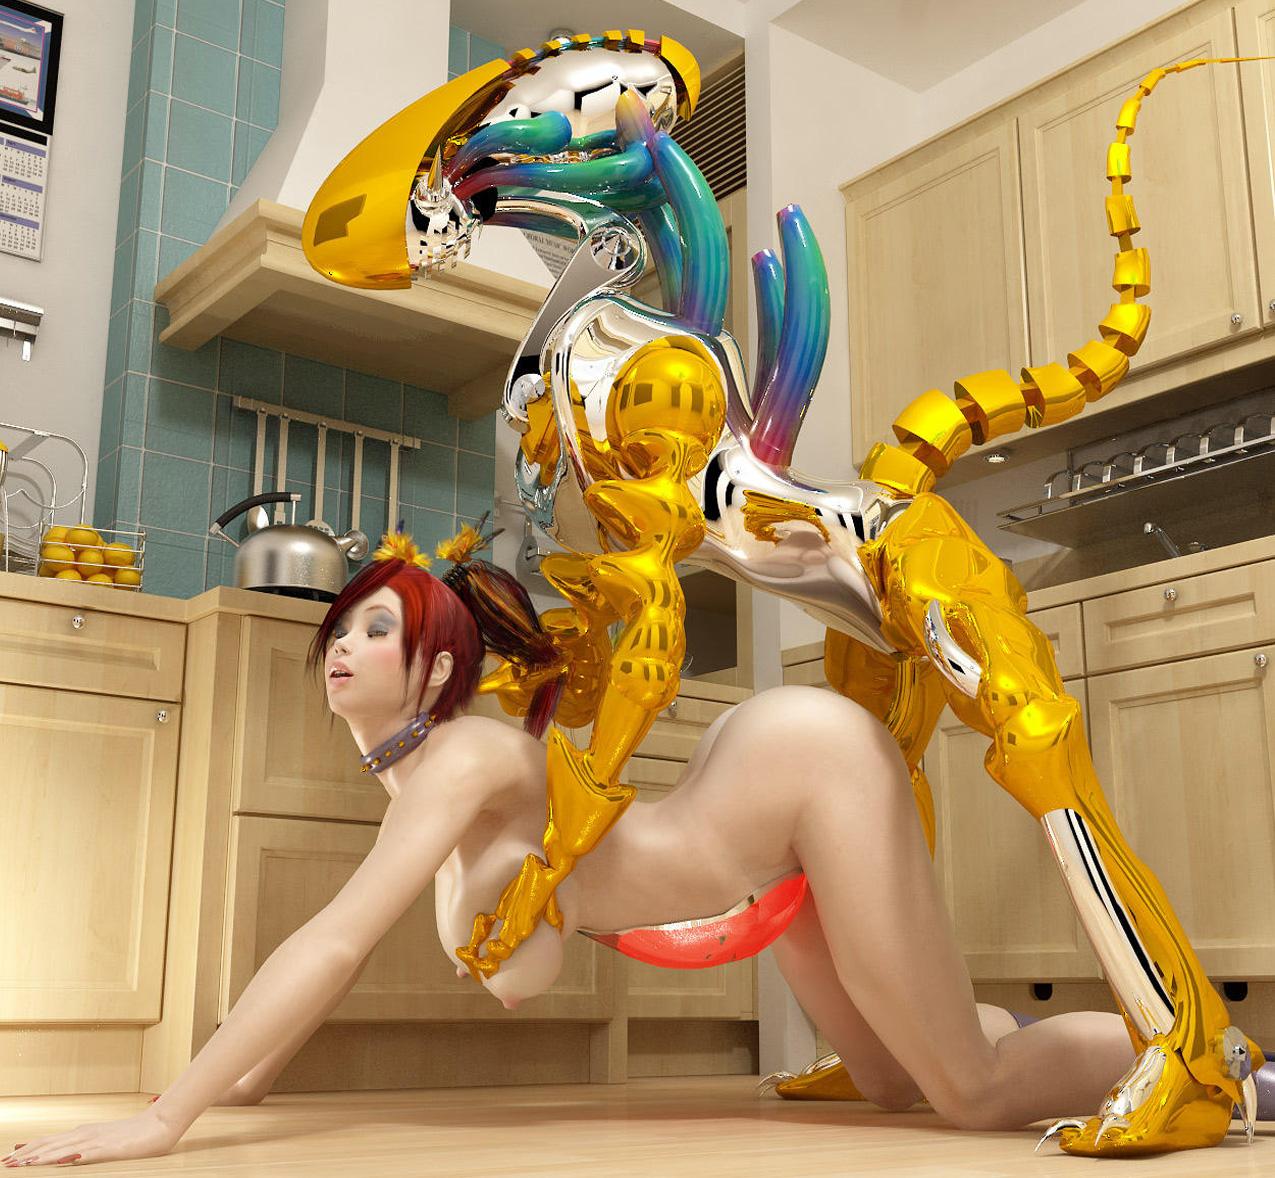 Robot girl porn sex pics